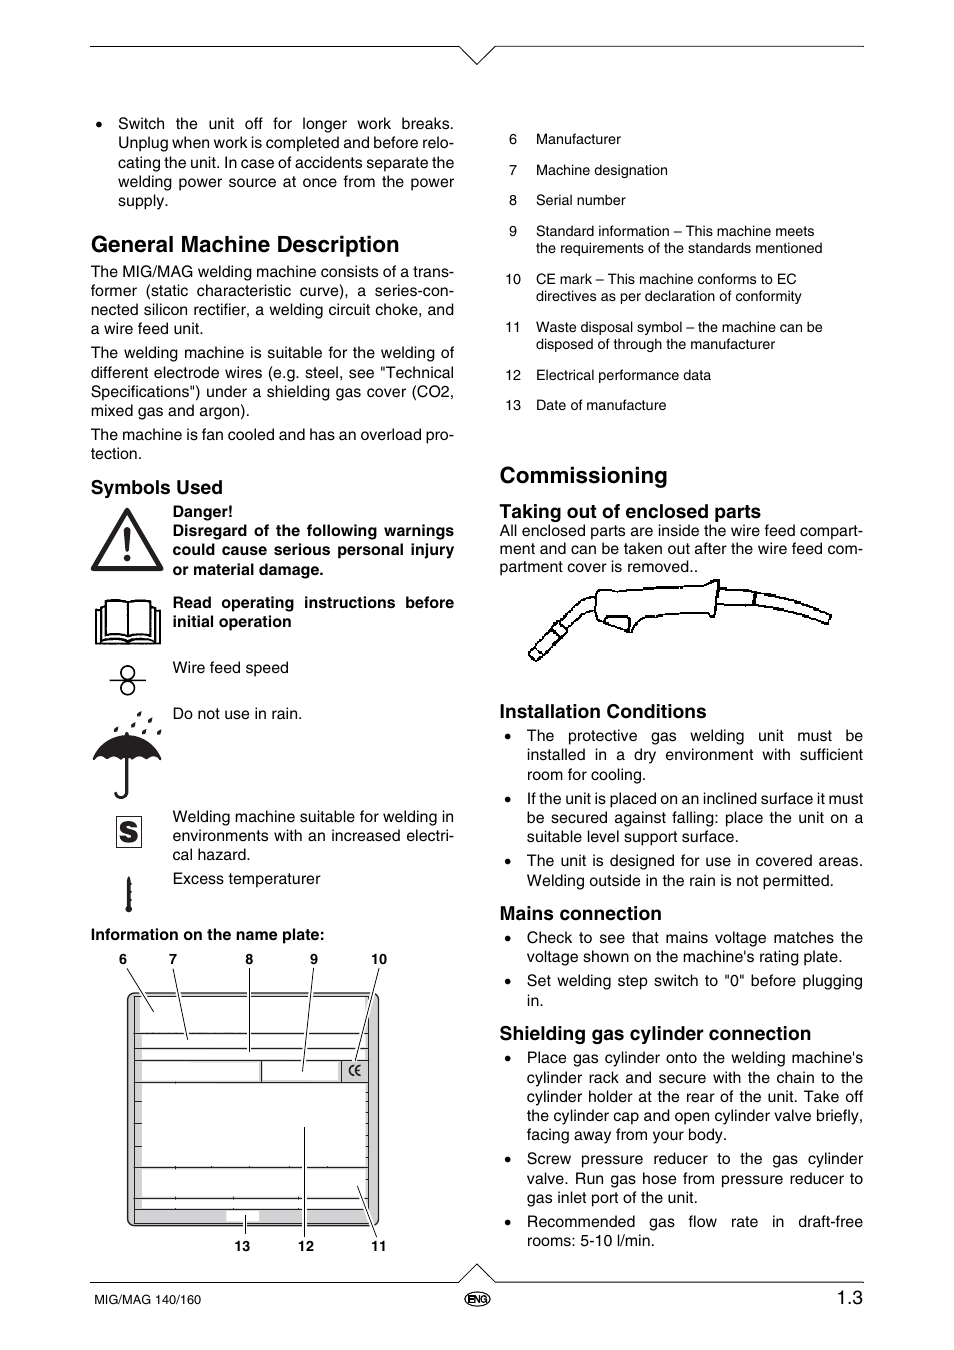 General machine description, Commissioning, Symbols used | Metabo ...